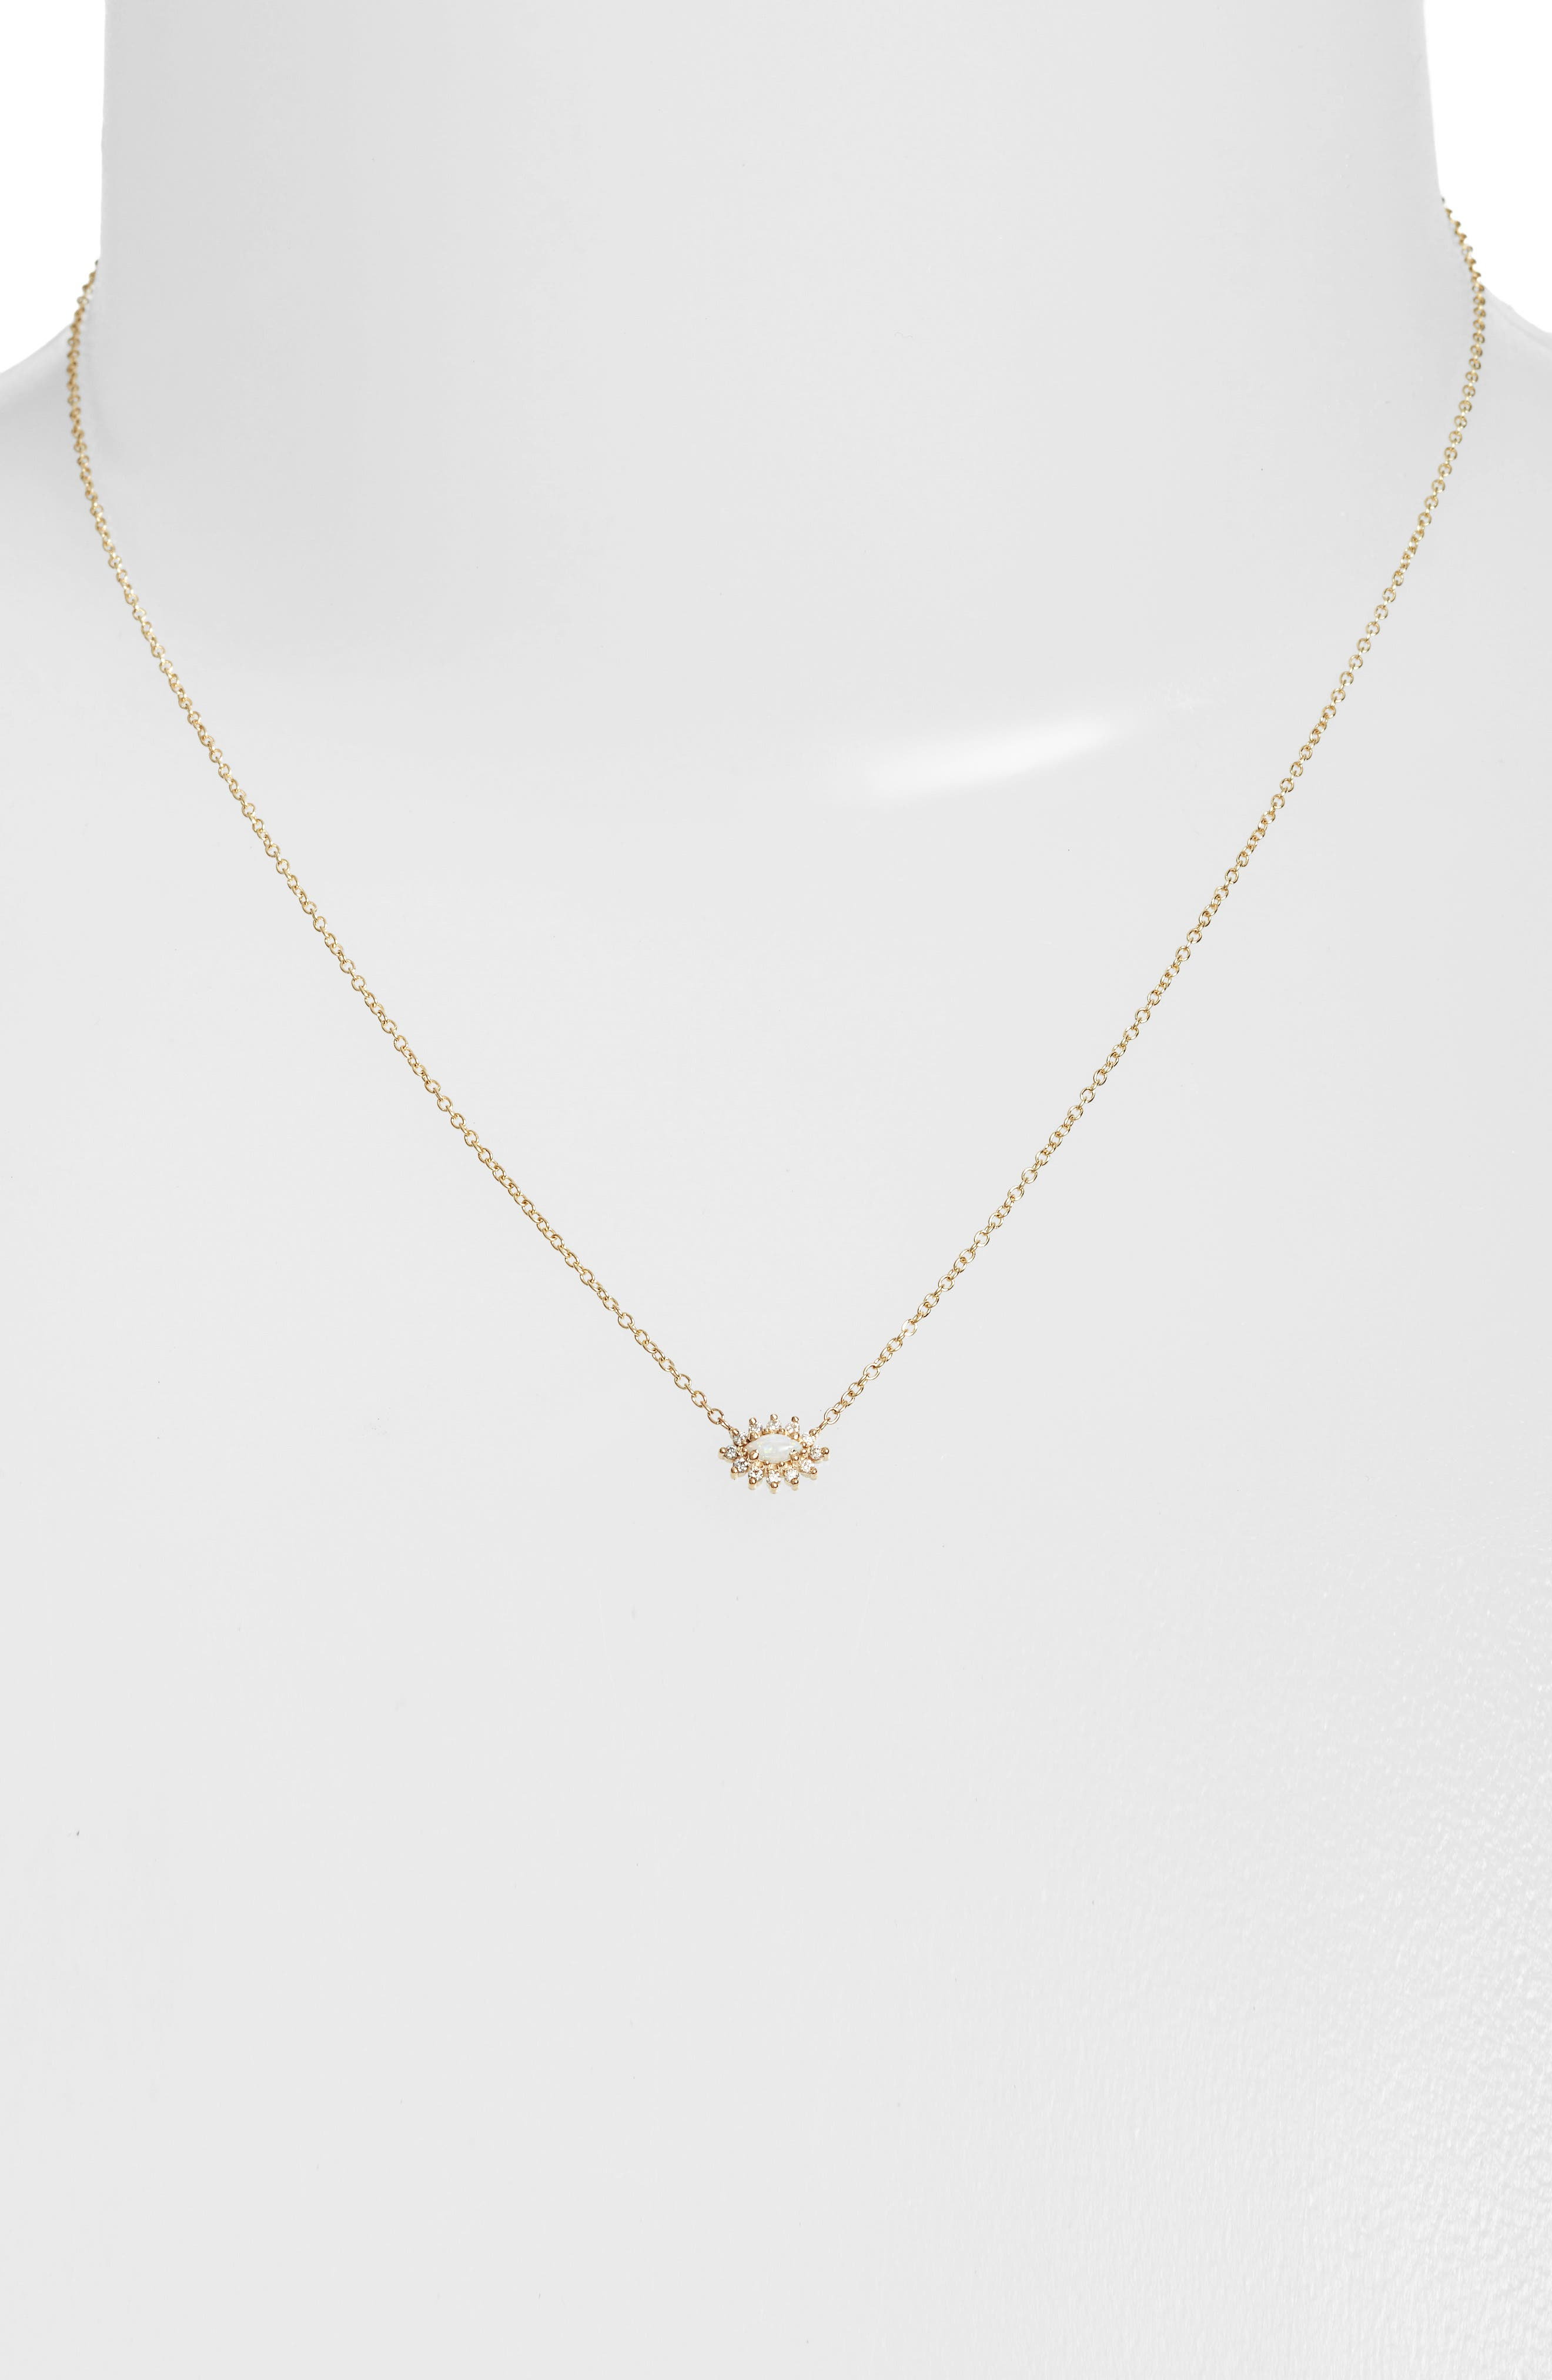 ZOË CHICCO Diamond & Opal Cluster Pendant Necklace